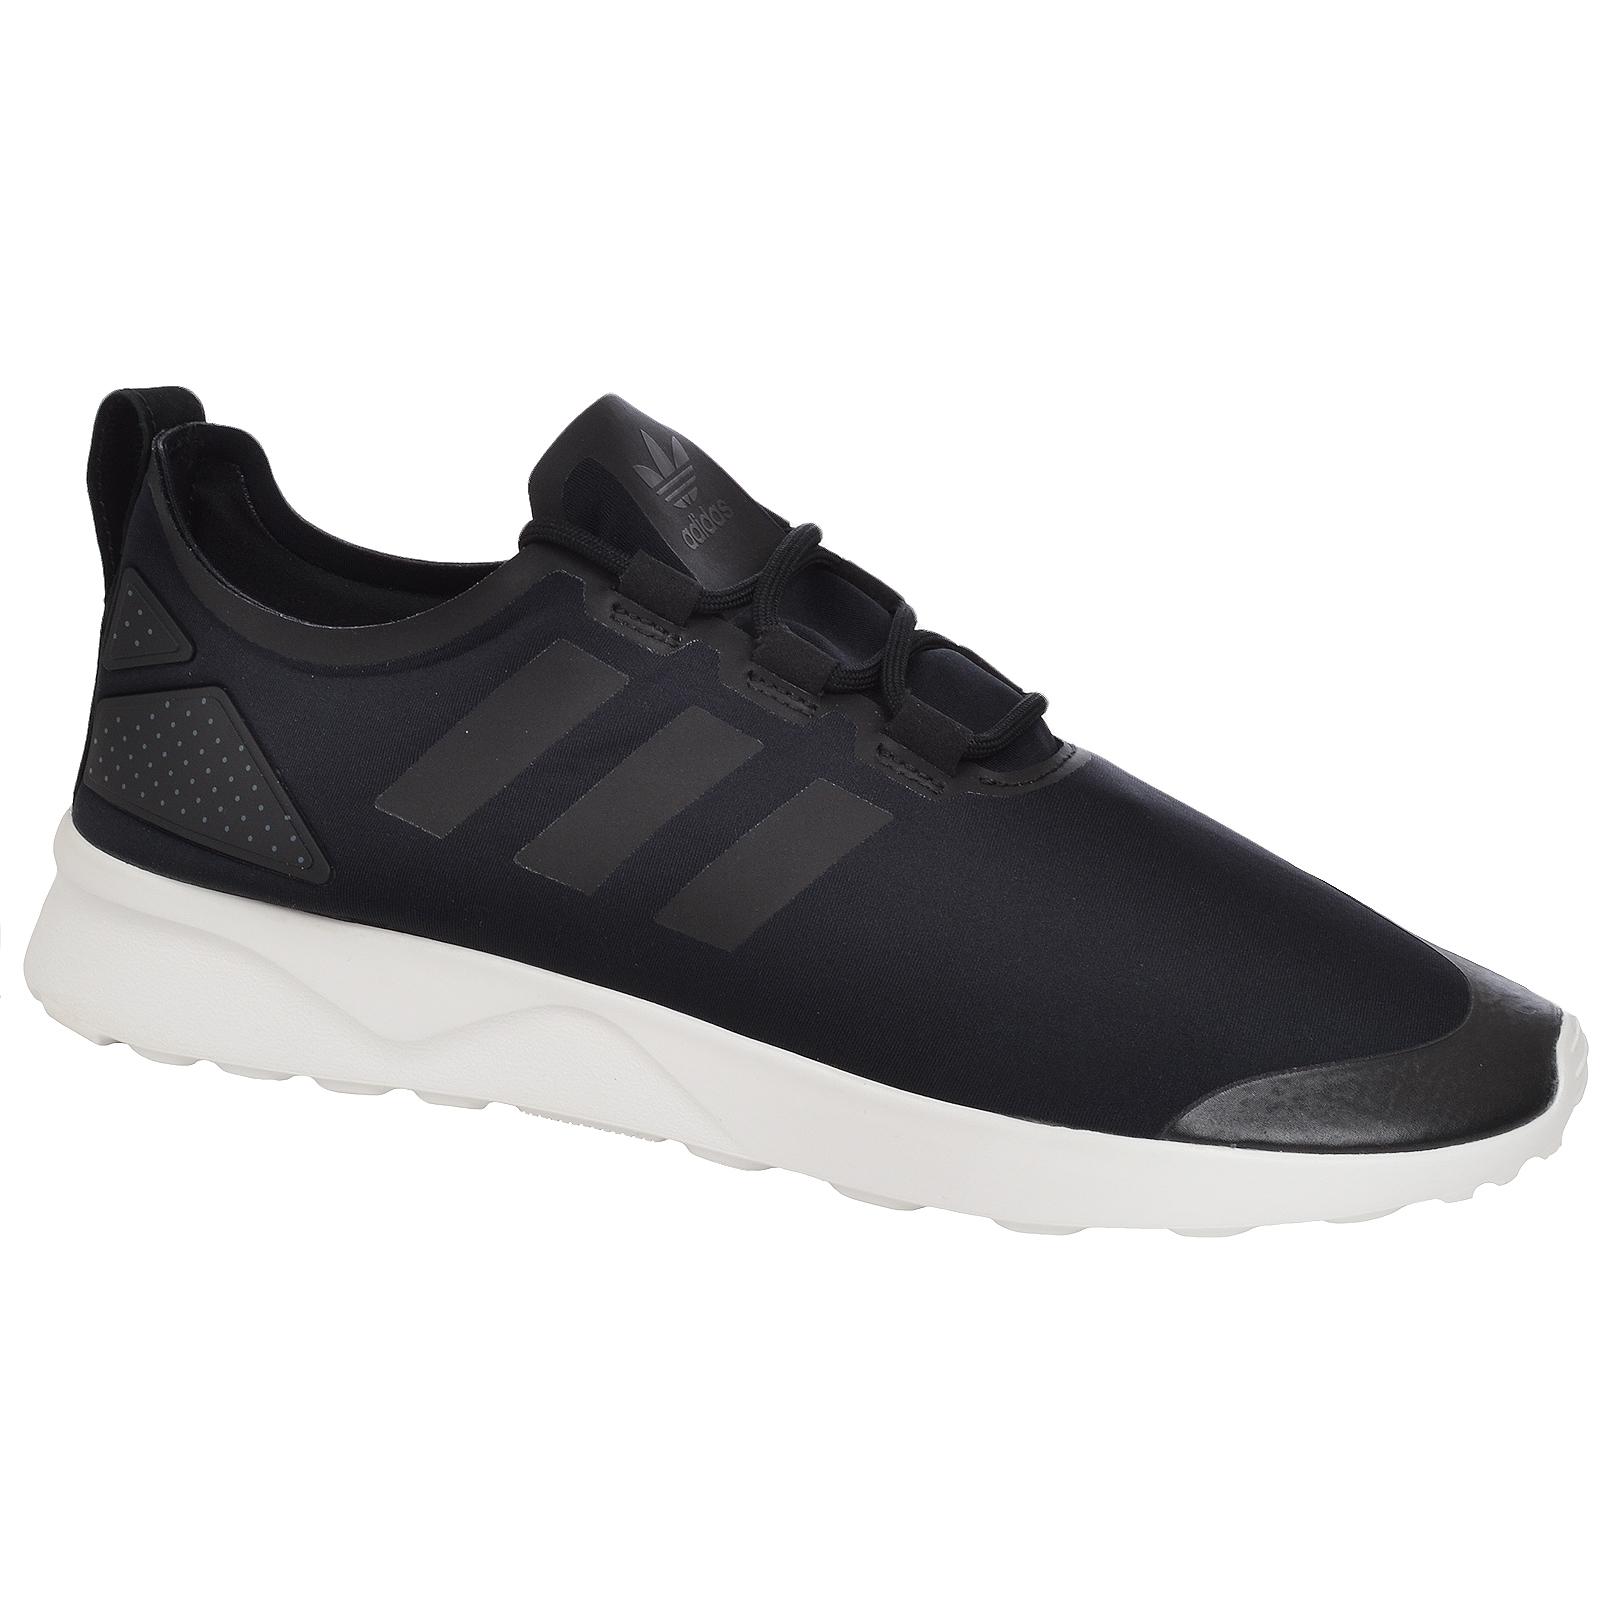 Size:3637383940 Dame adidas Originals TUBULAR RUNNER